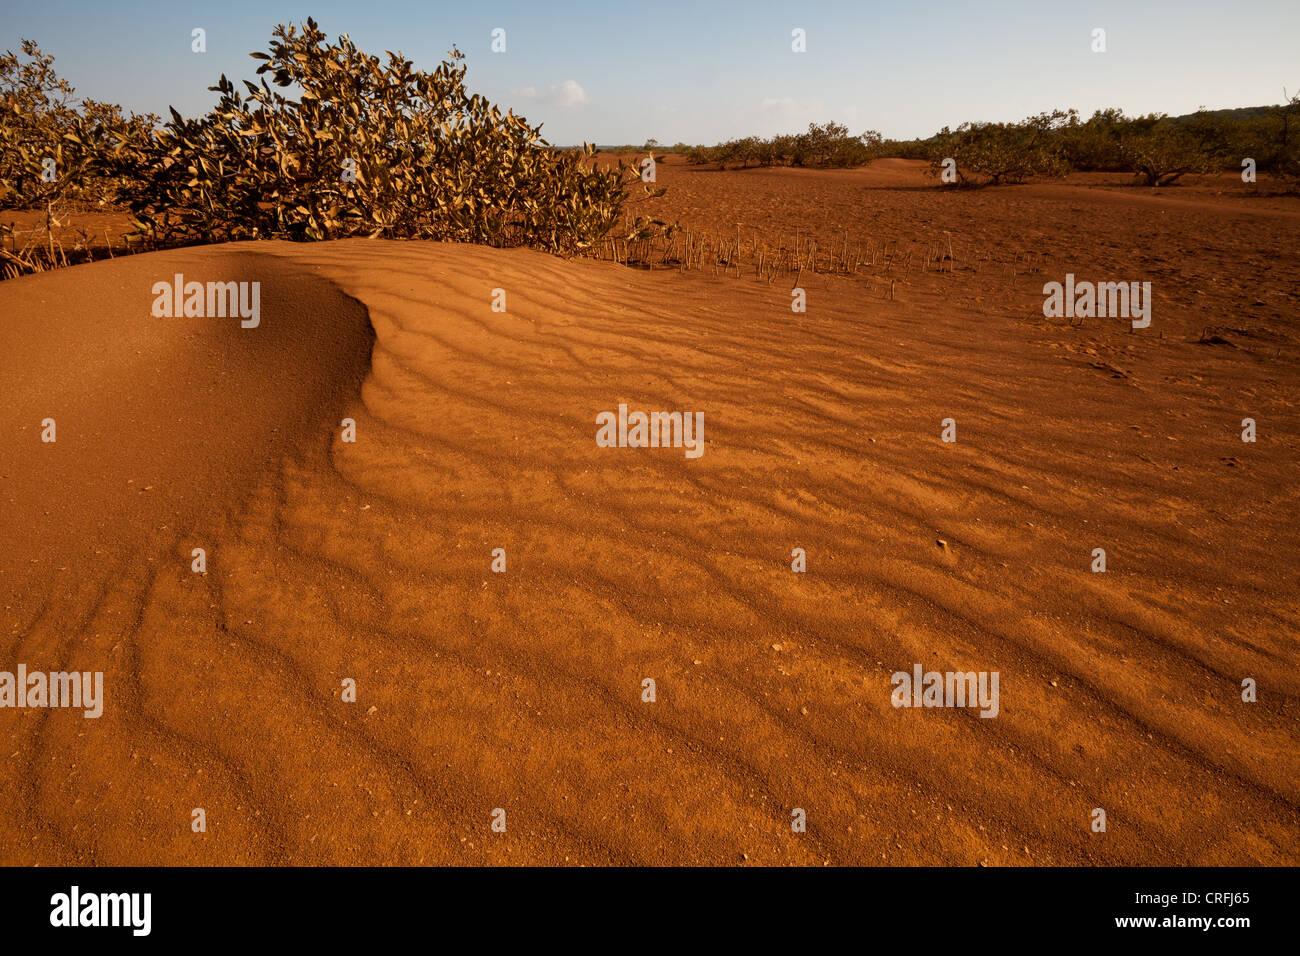 Sand dunes in Sarigua national park (desert), Herrera province, Republic of Panama. - Stock Image